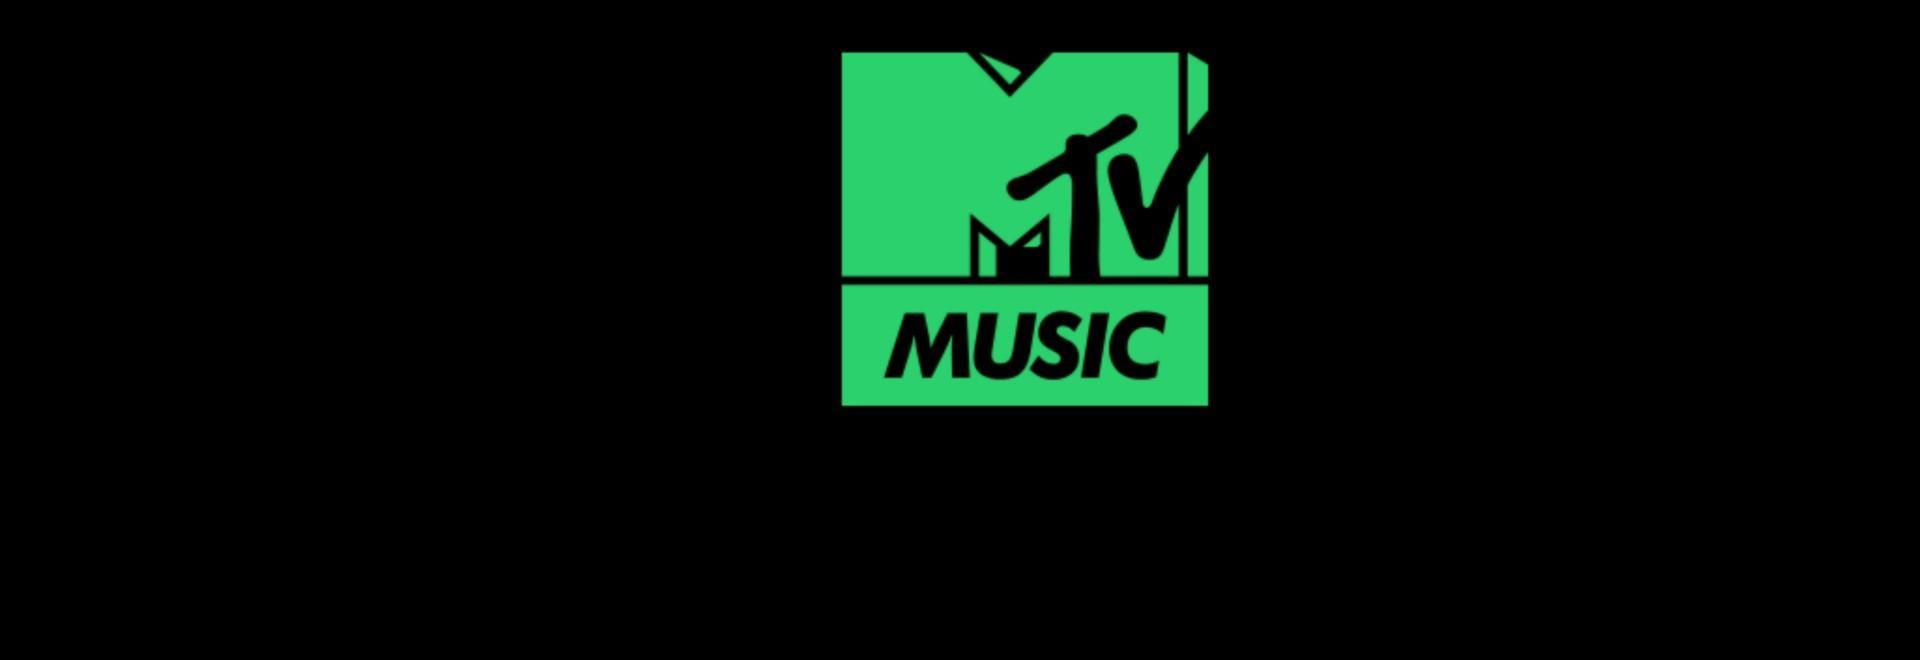 100% Music